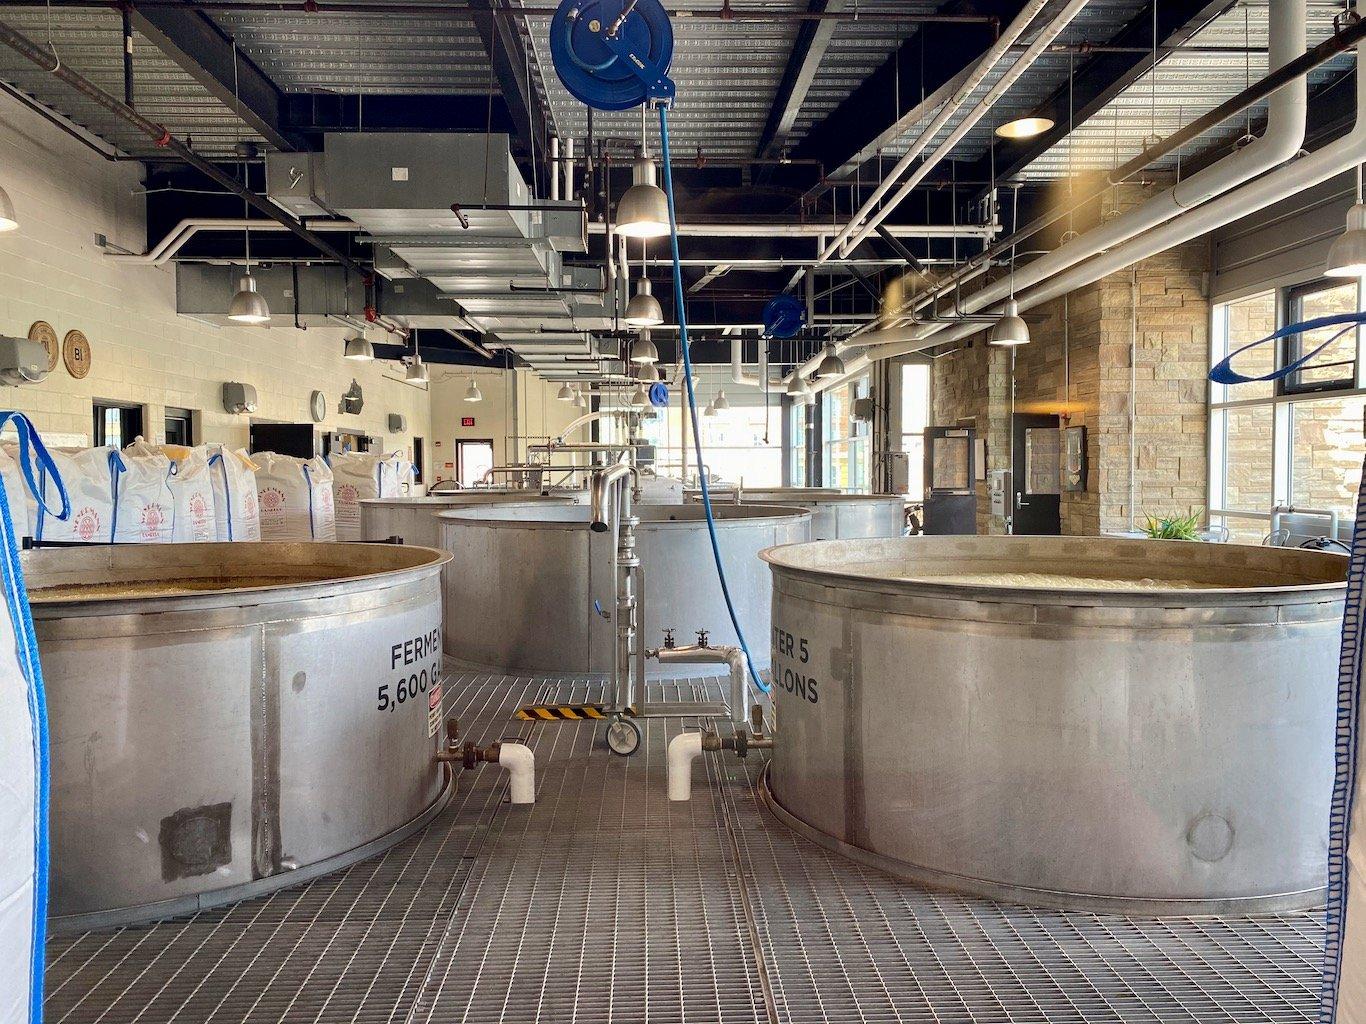 Fermenters - New Riff Distilling Distillery